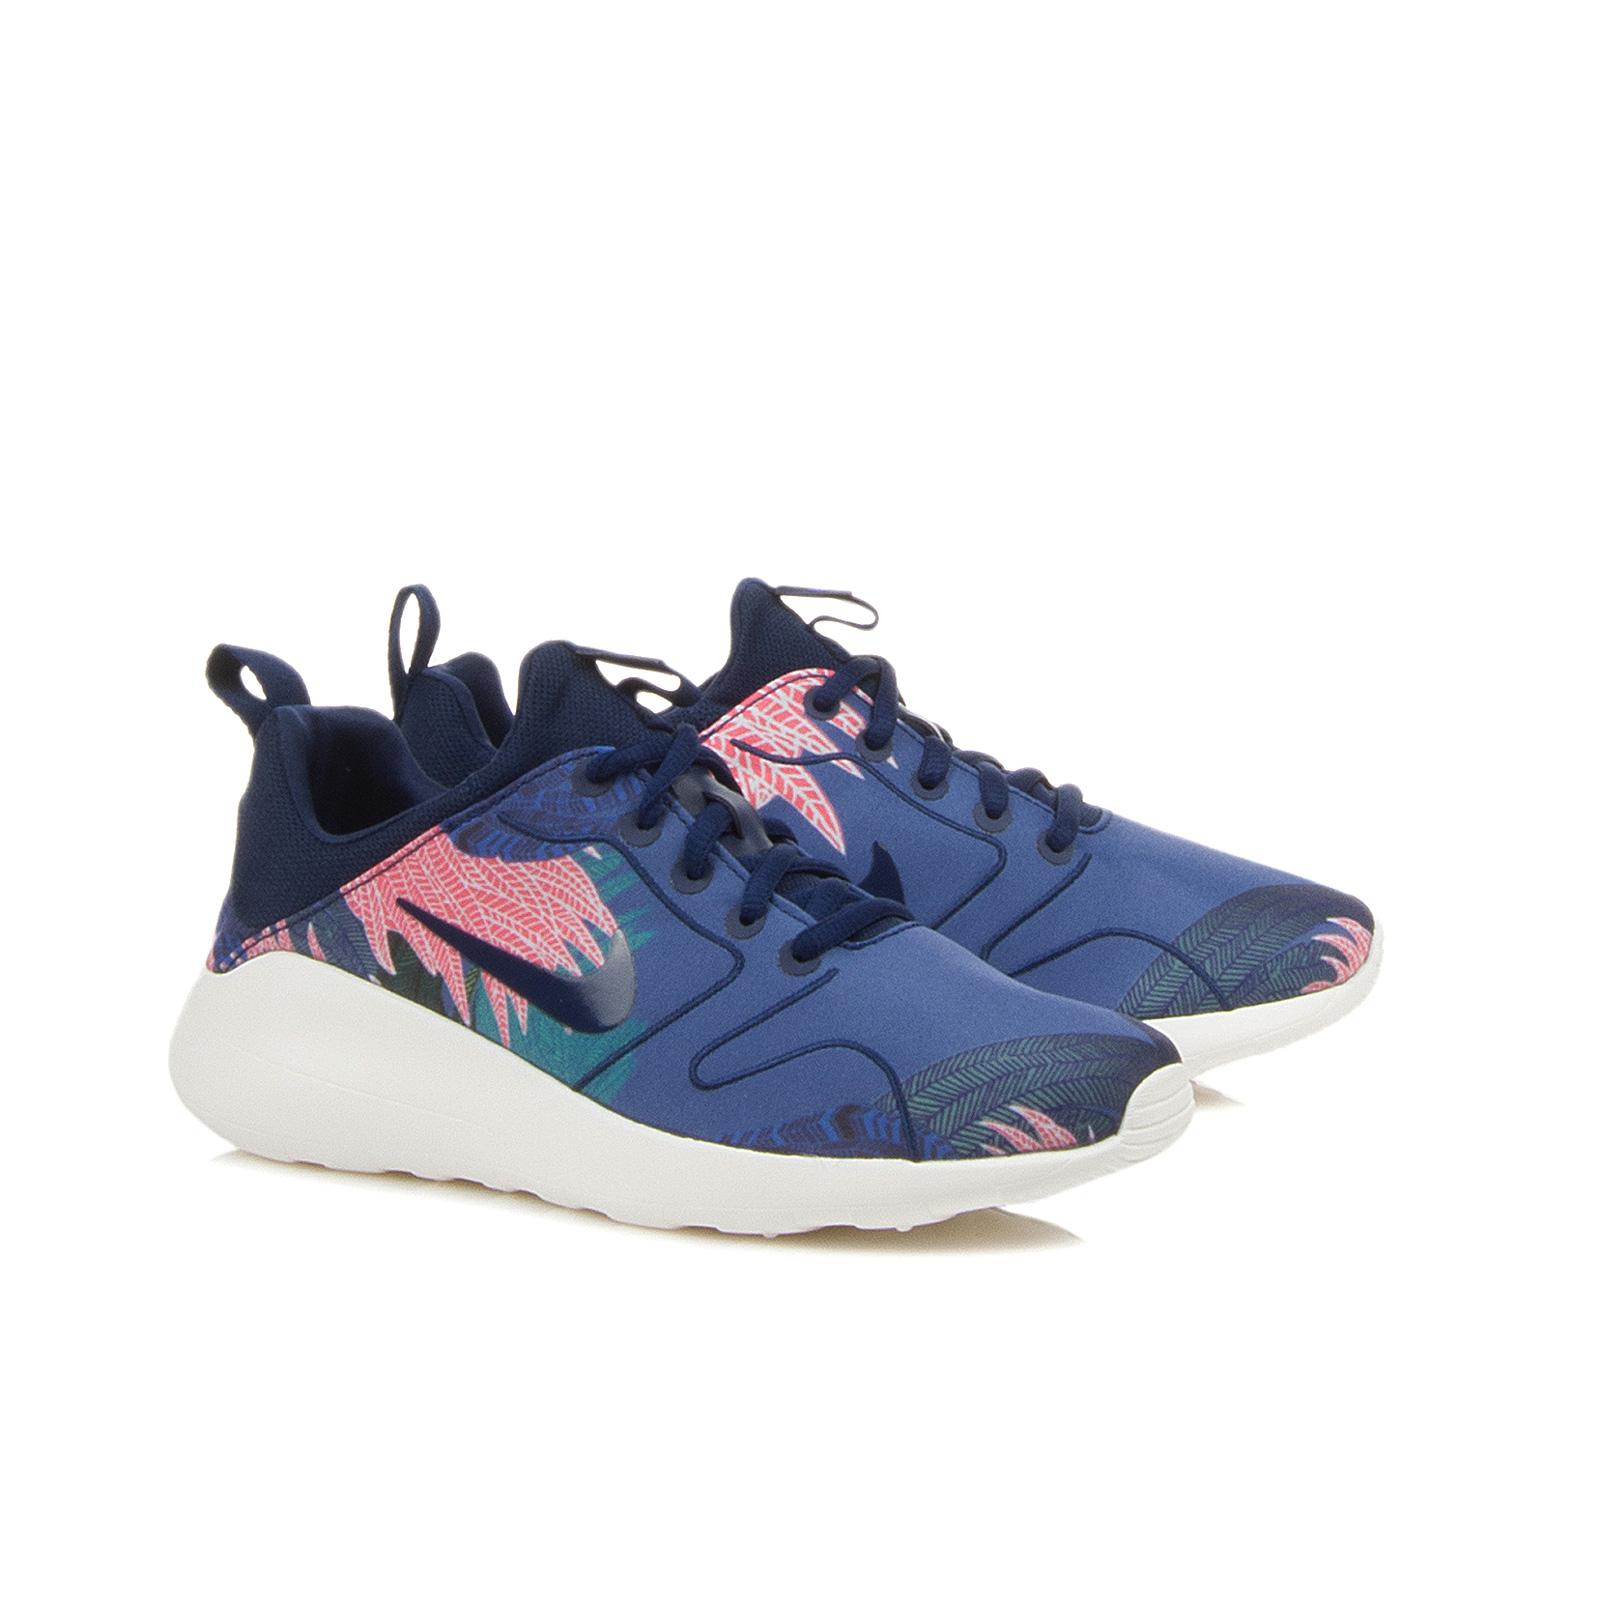 Nike - WMNS NIKE KAISHI 2.0 PRINT - BINARY BLUE/BINA